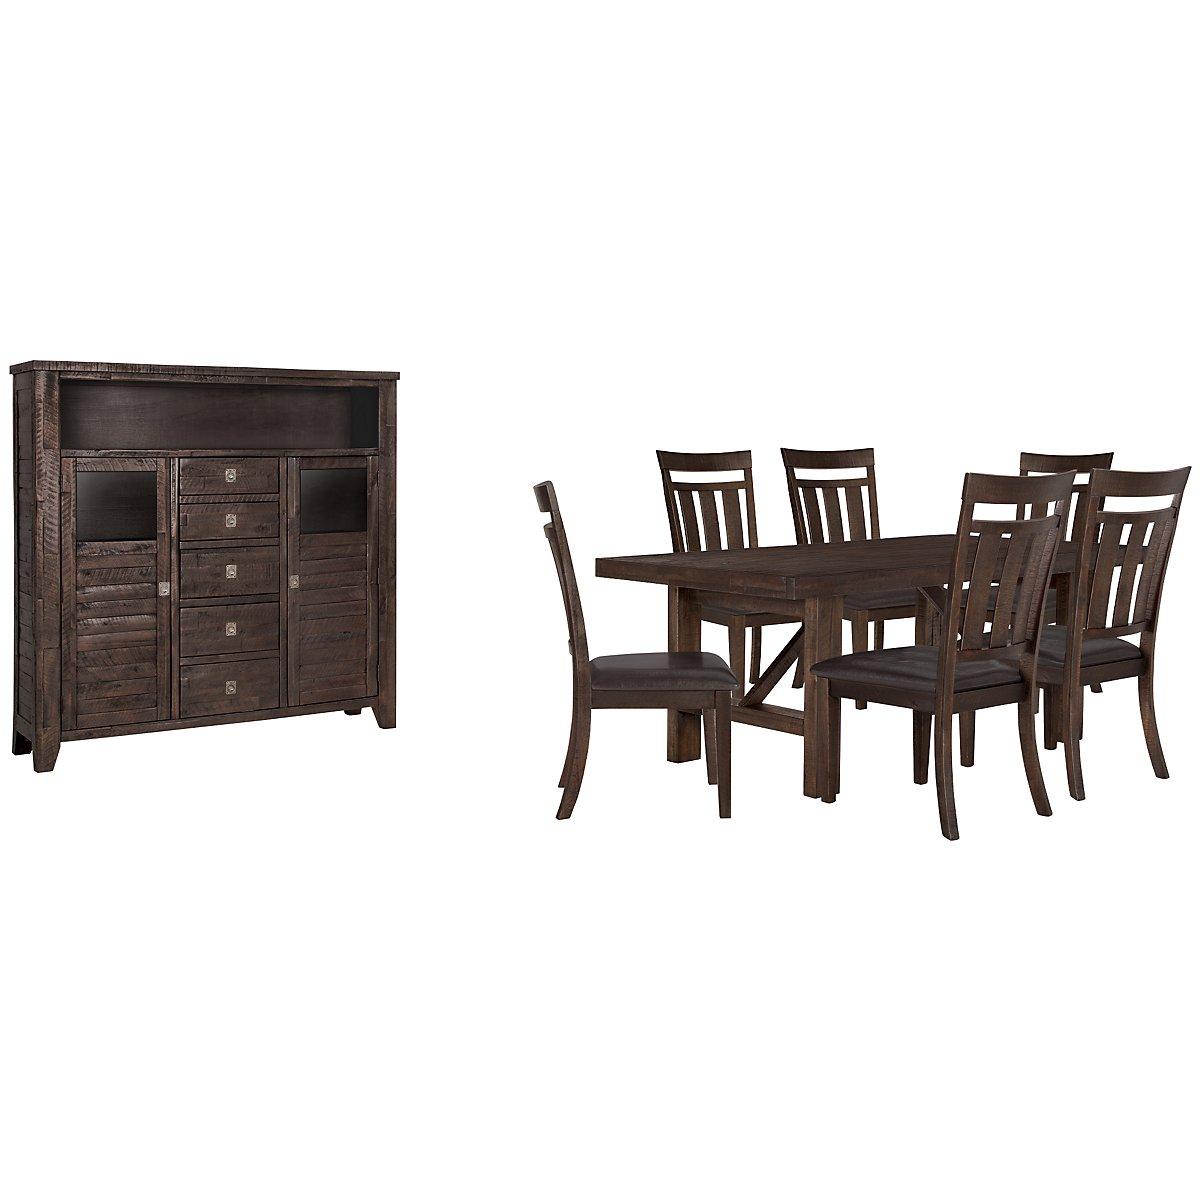 Kona Grove Dark Tone Wood Rect Large Dining Room